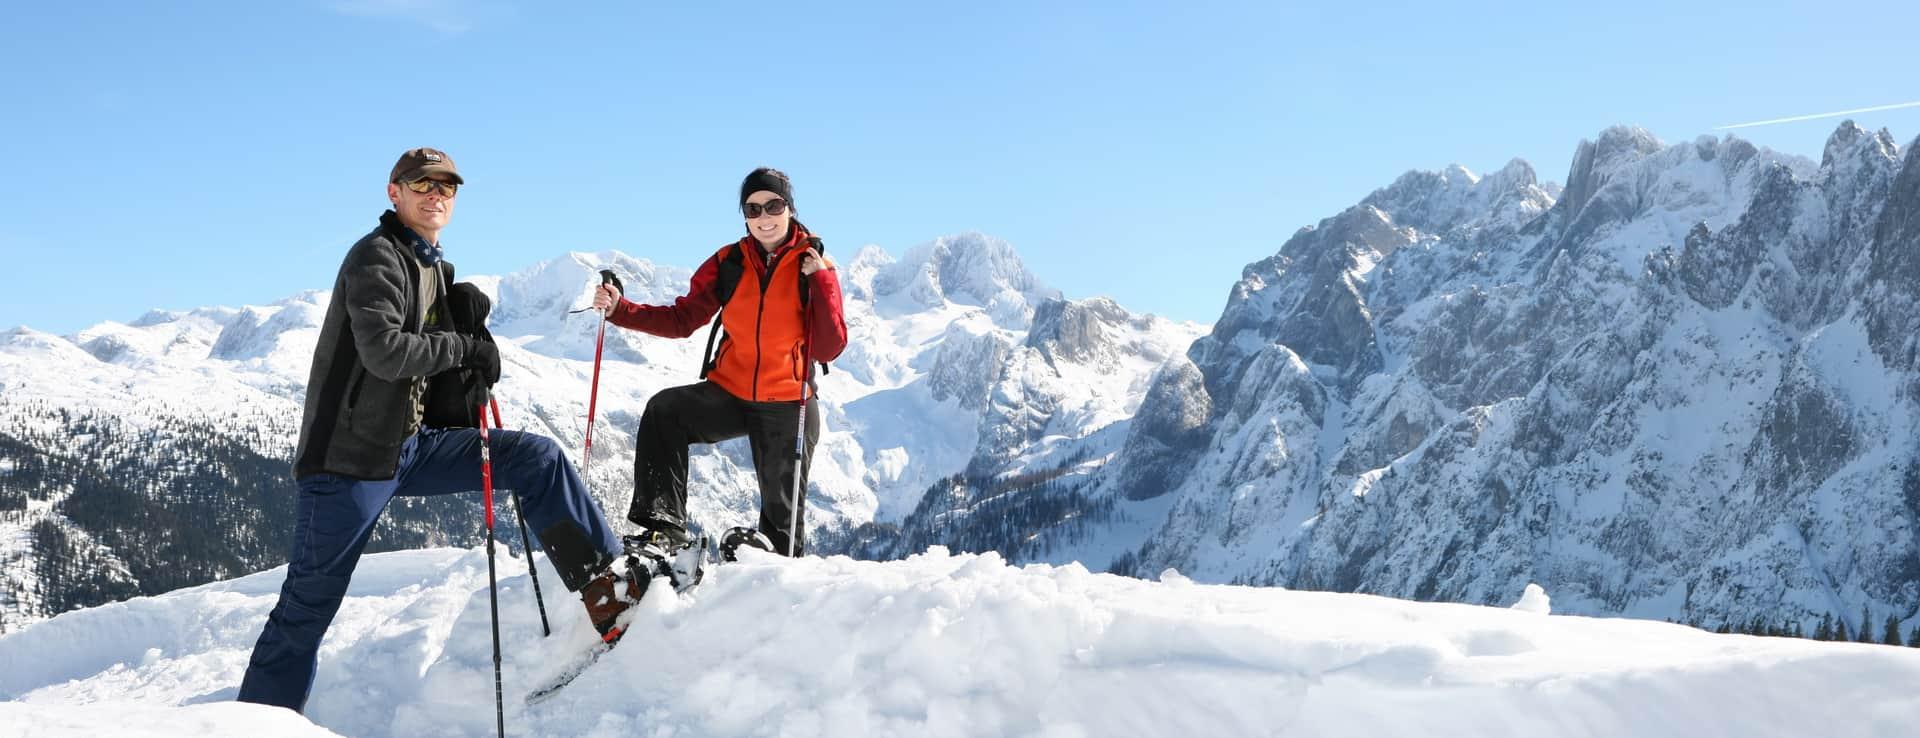 Snösko vandring snöskovandring Gosau Dachstein Salzkammergut Österrike skidsemester